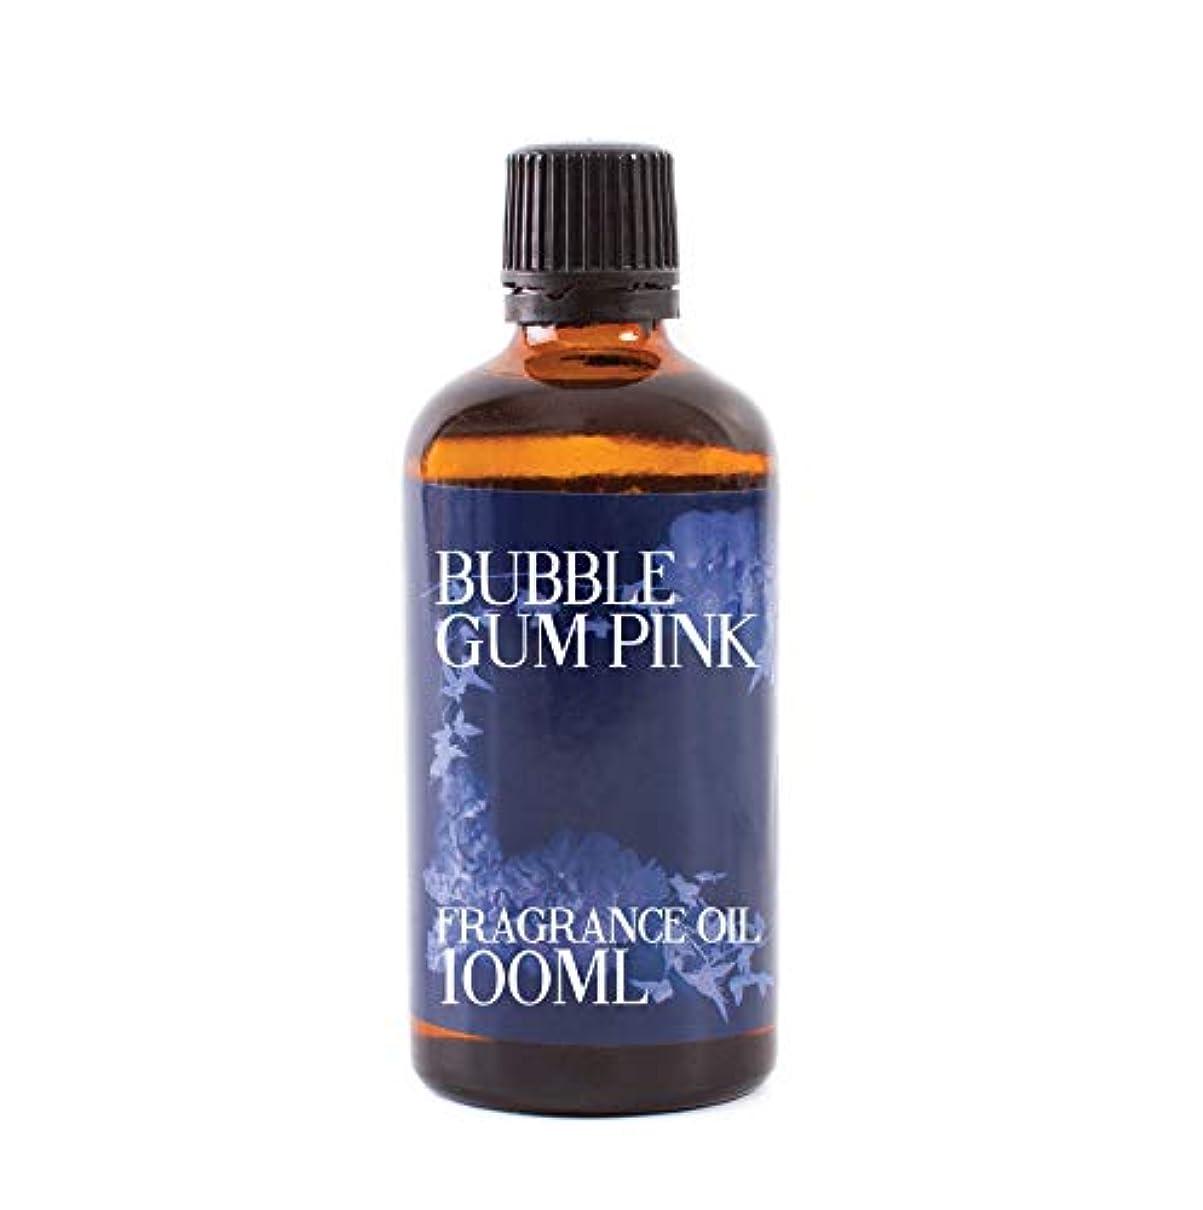 Mystic Moments | Bubble Gum Pink Fragrance Oil - 100ml